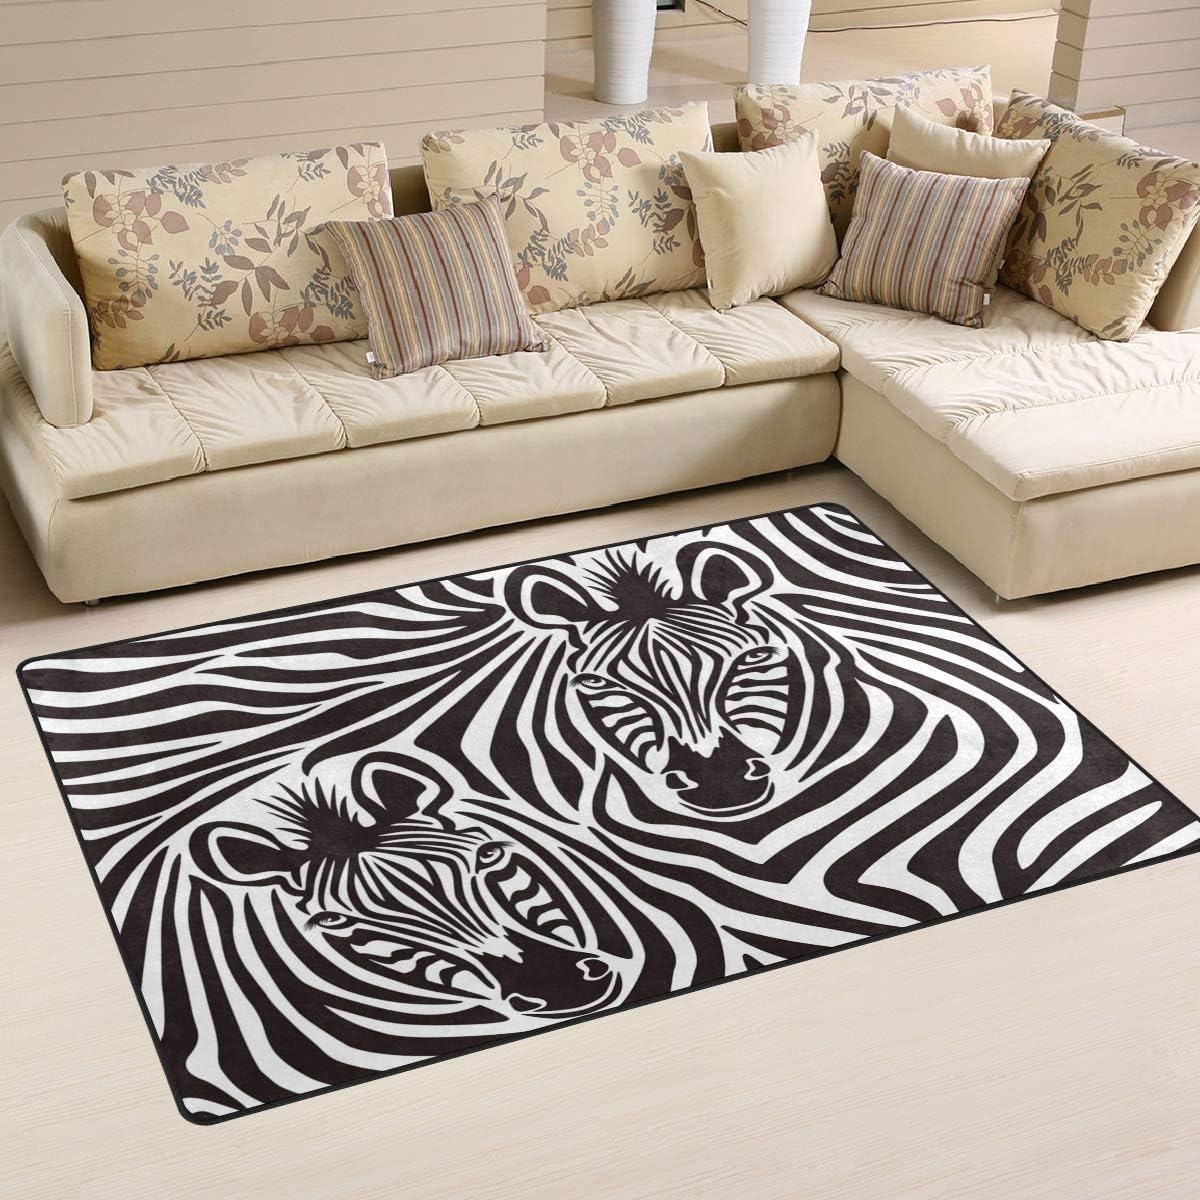 Linomo Area Rug Zebra Print Floor Rugs Doormat Living Room Home Decor Carpets Area Mats For Kids Boys Girls Bedroom 60 X 39 Inches Amazon Ca Home Kitchen